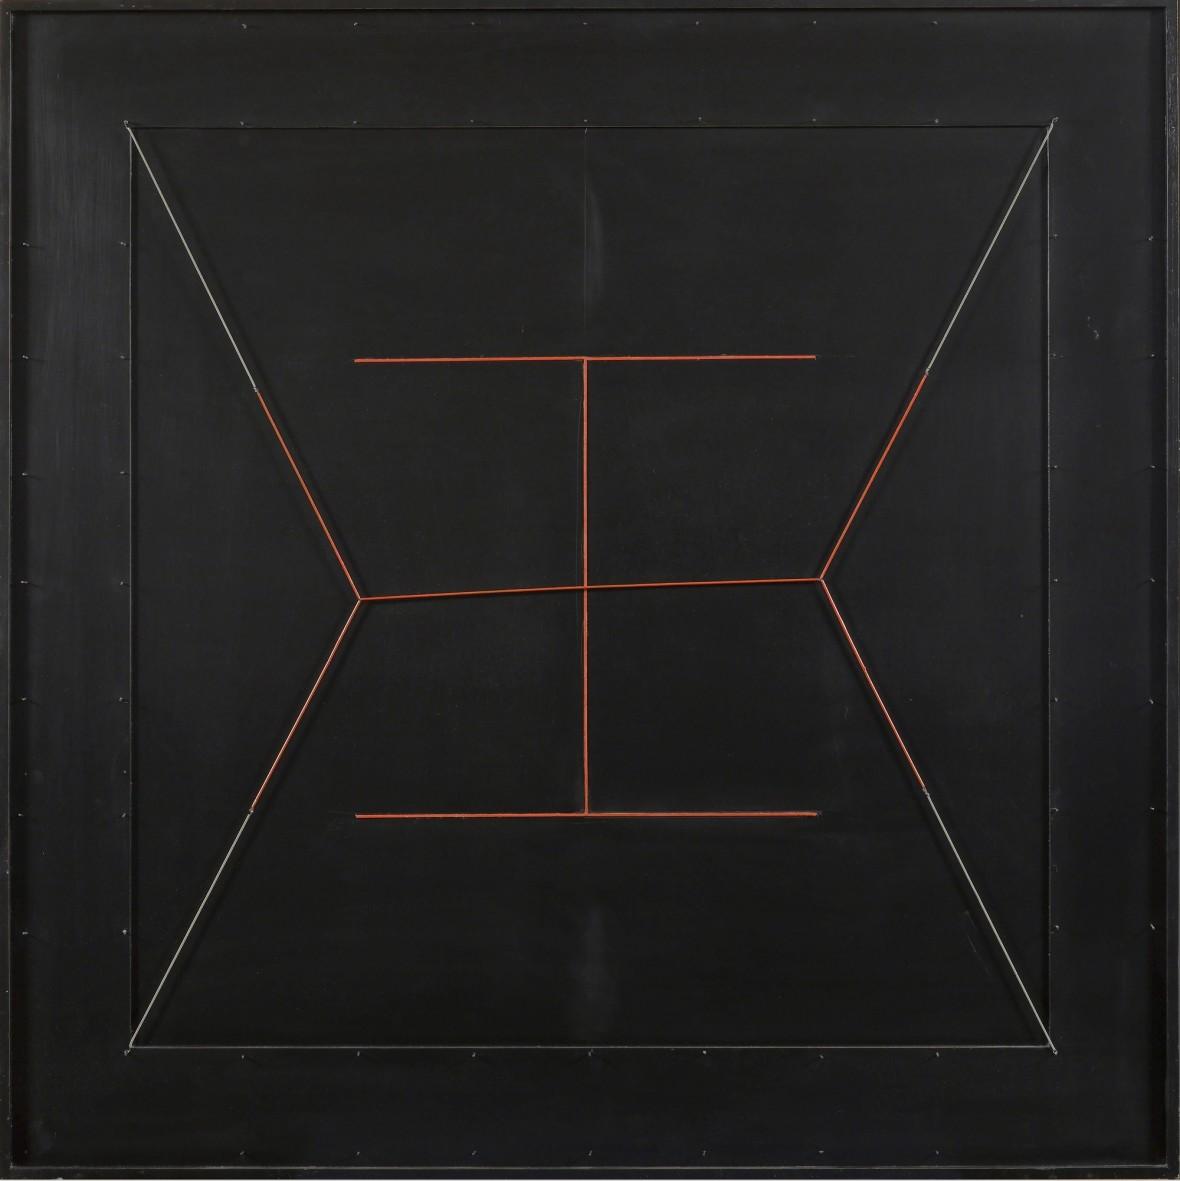 Spazio elastico, doppia I rossa (Elastic Space, Double Red I)